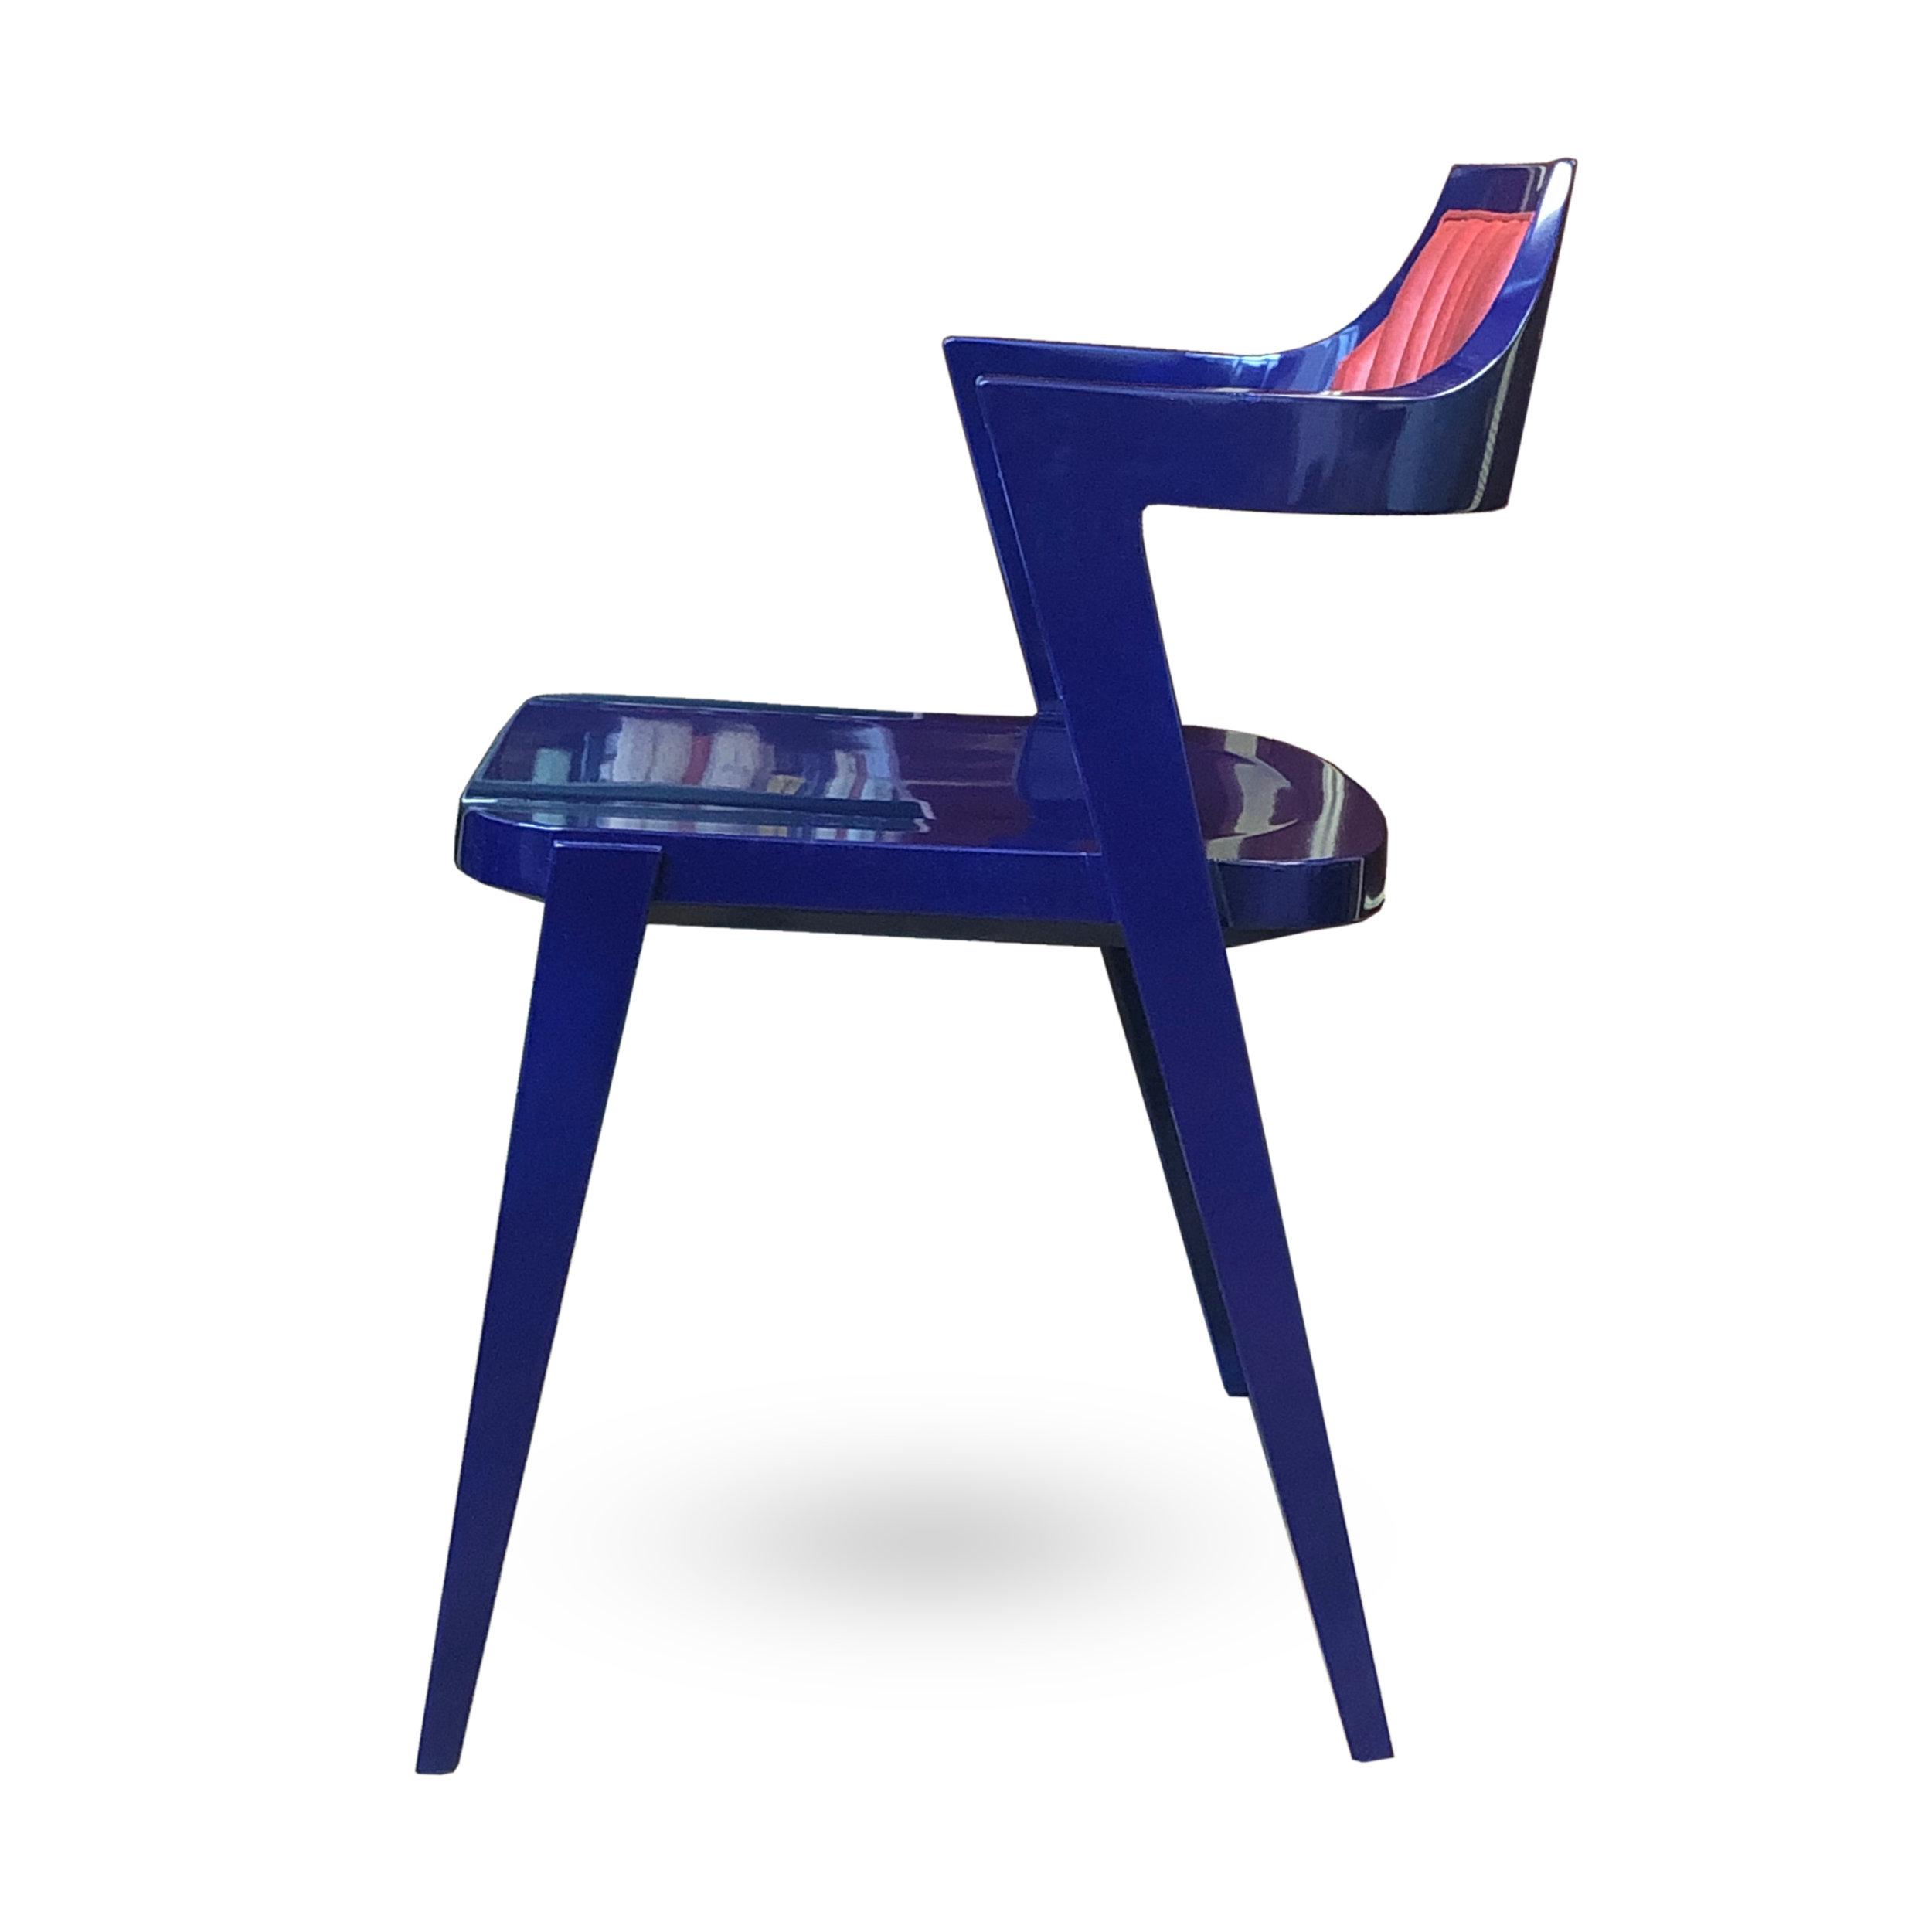 R813-ink-blue-stalking-chair-leather-upholstery-nailhead-trim-modern-design-Victoria&Son.jpg